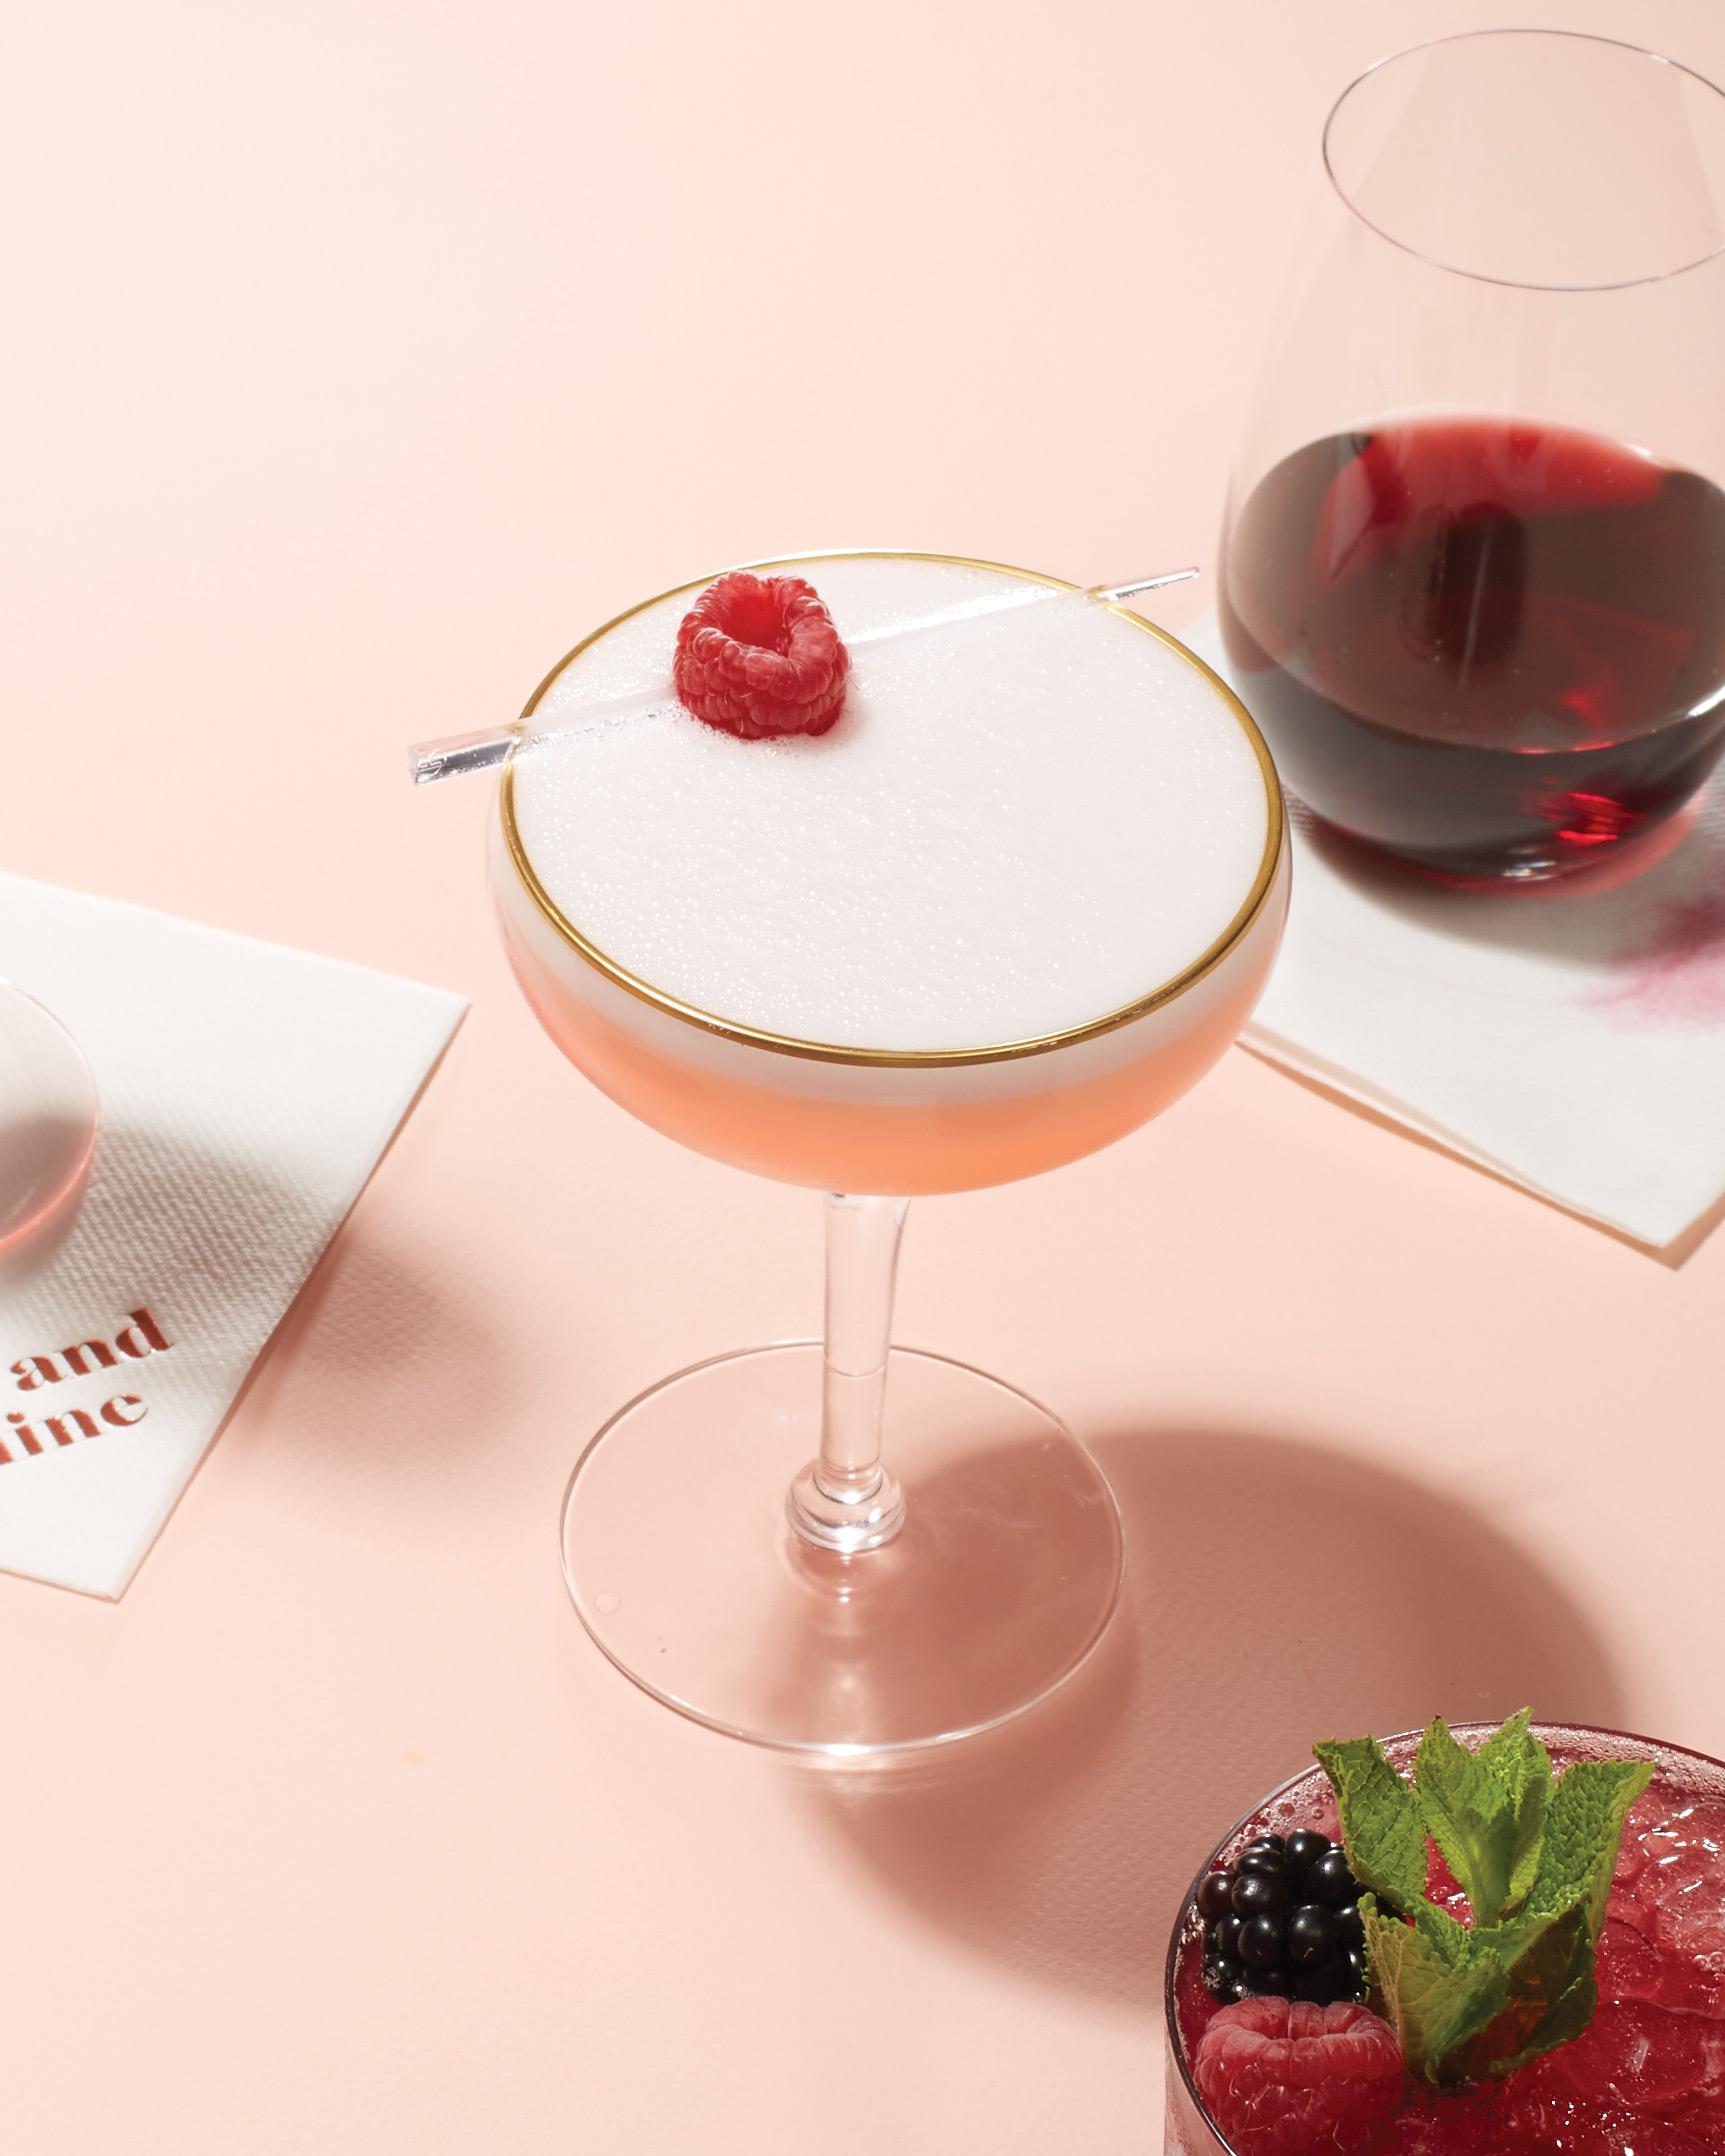 blush-berry-cocktails-clover-club-skewered-raspberry-047-d113029.jpg